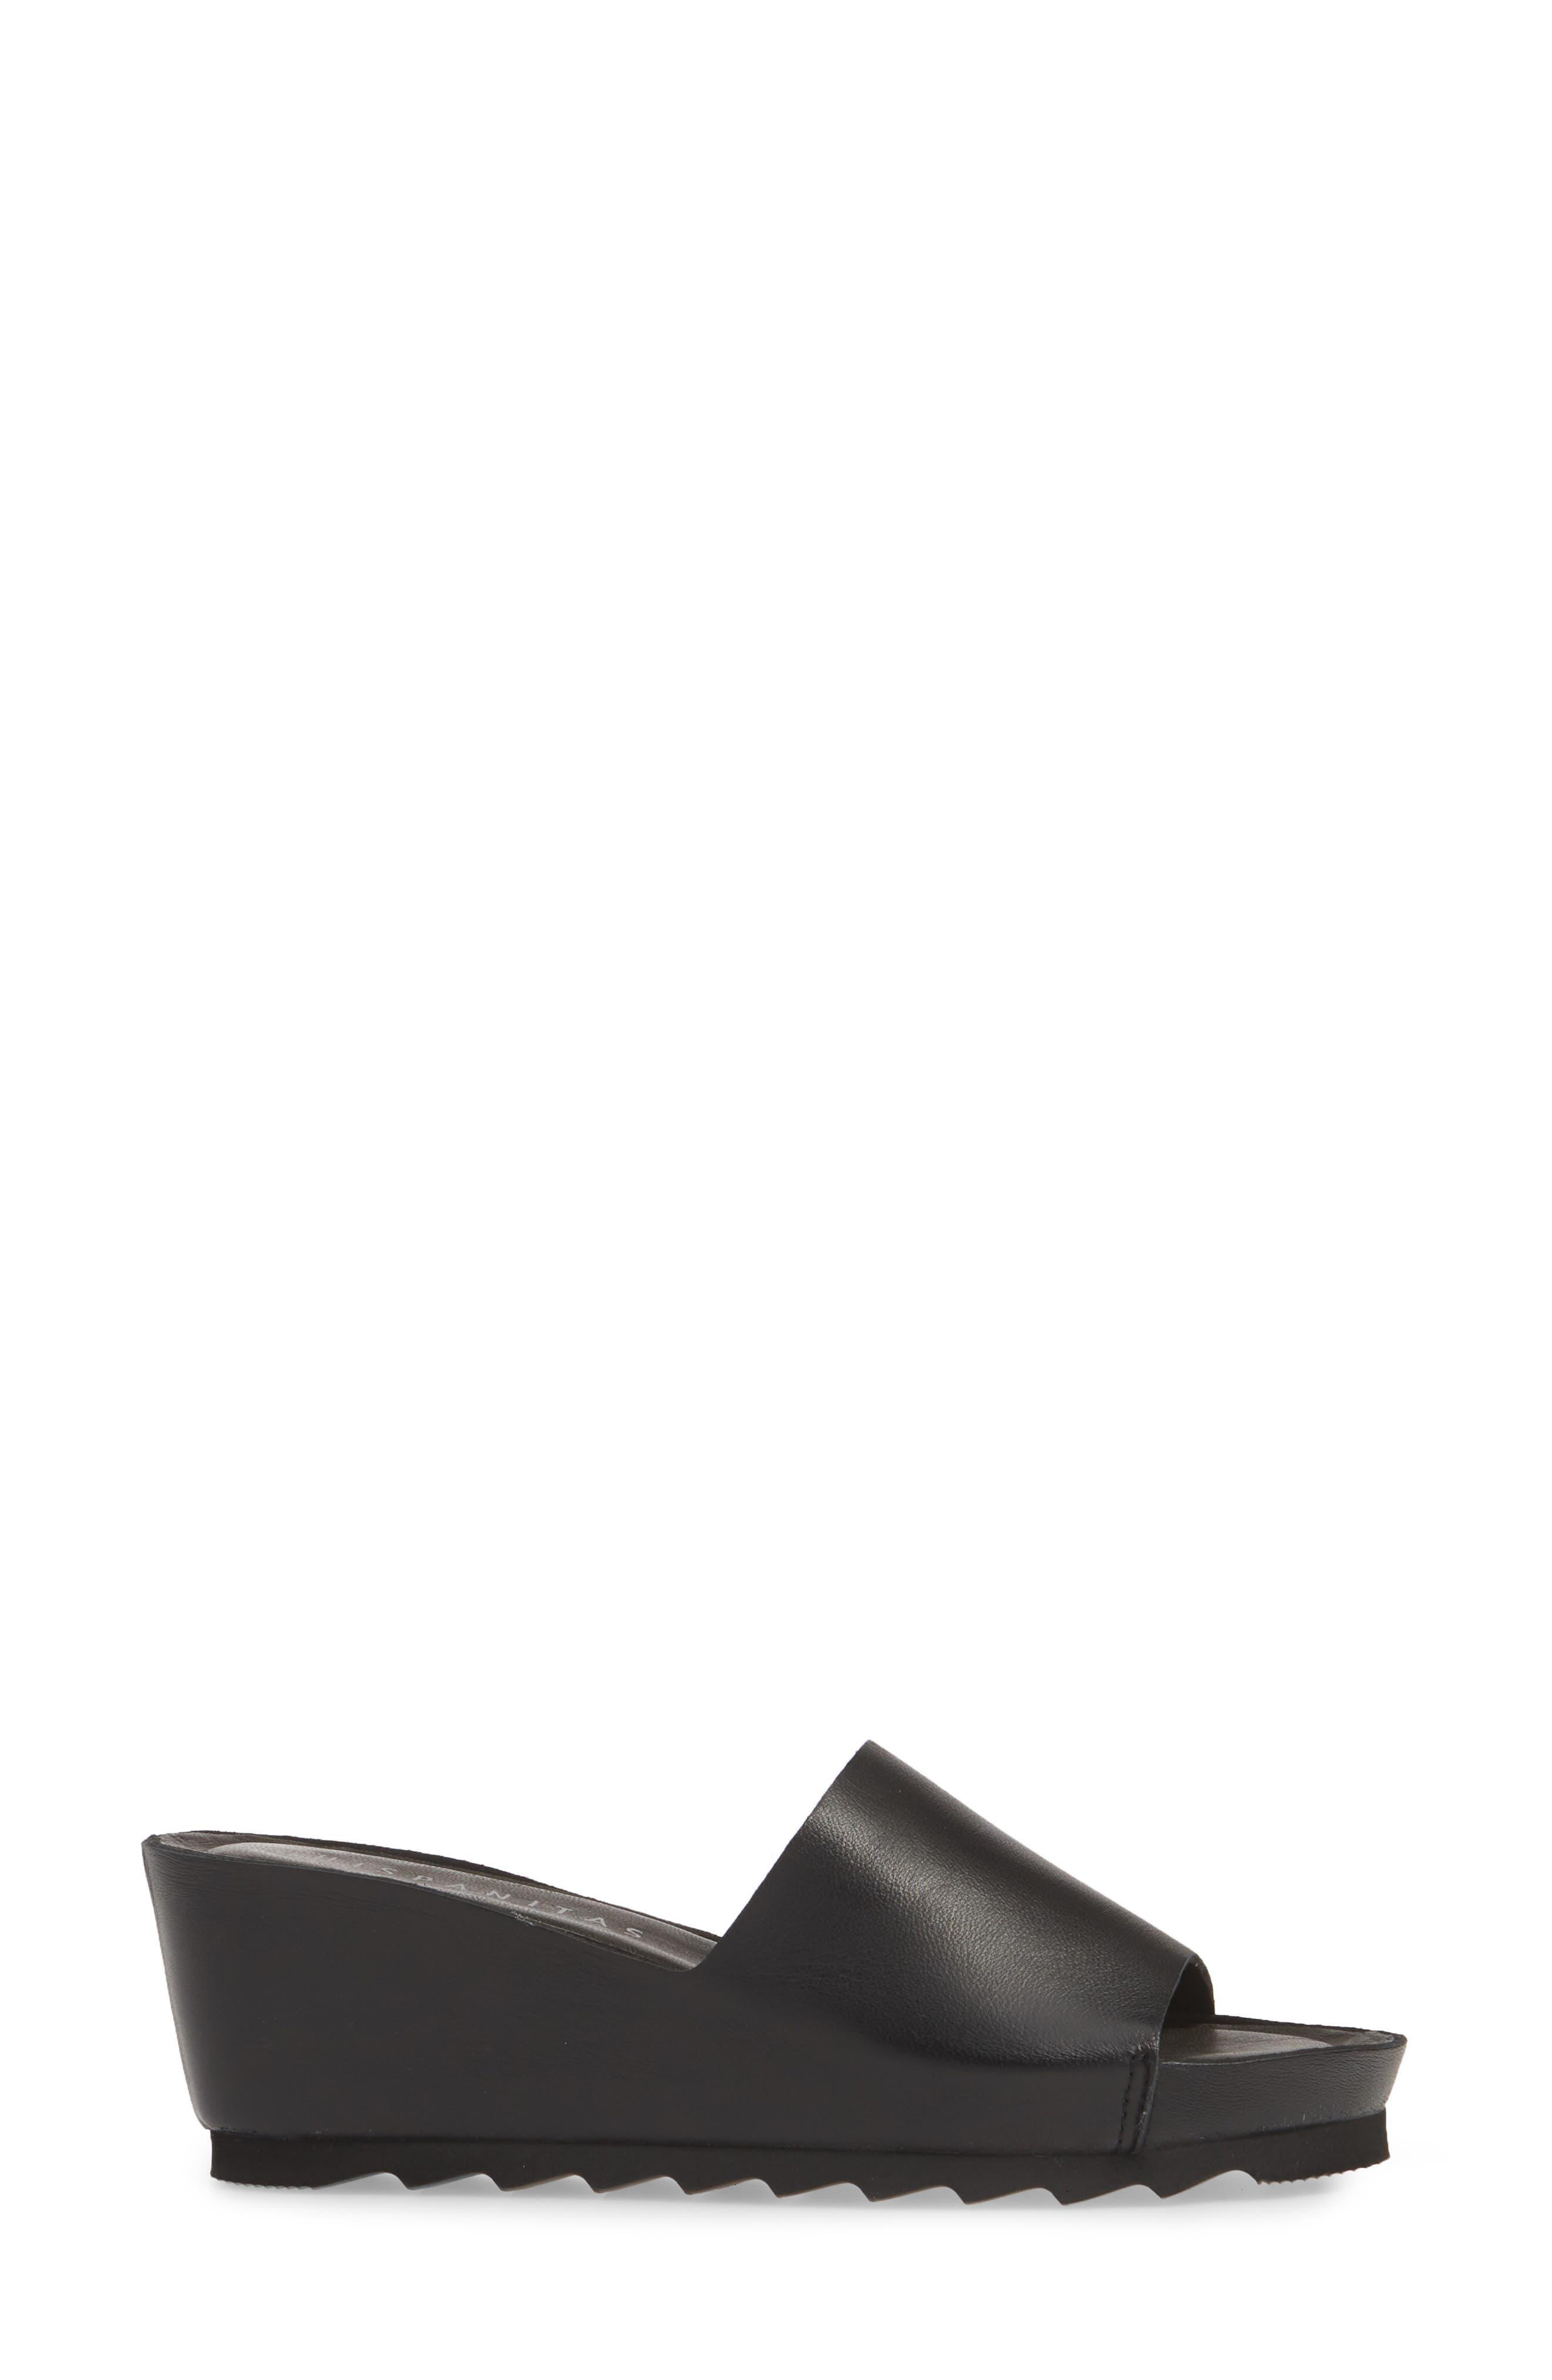 HISPANITAS, Vega Slide Sandal, Alternate thumbnail 3, color, BLACK LEATHER